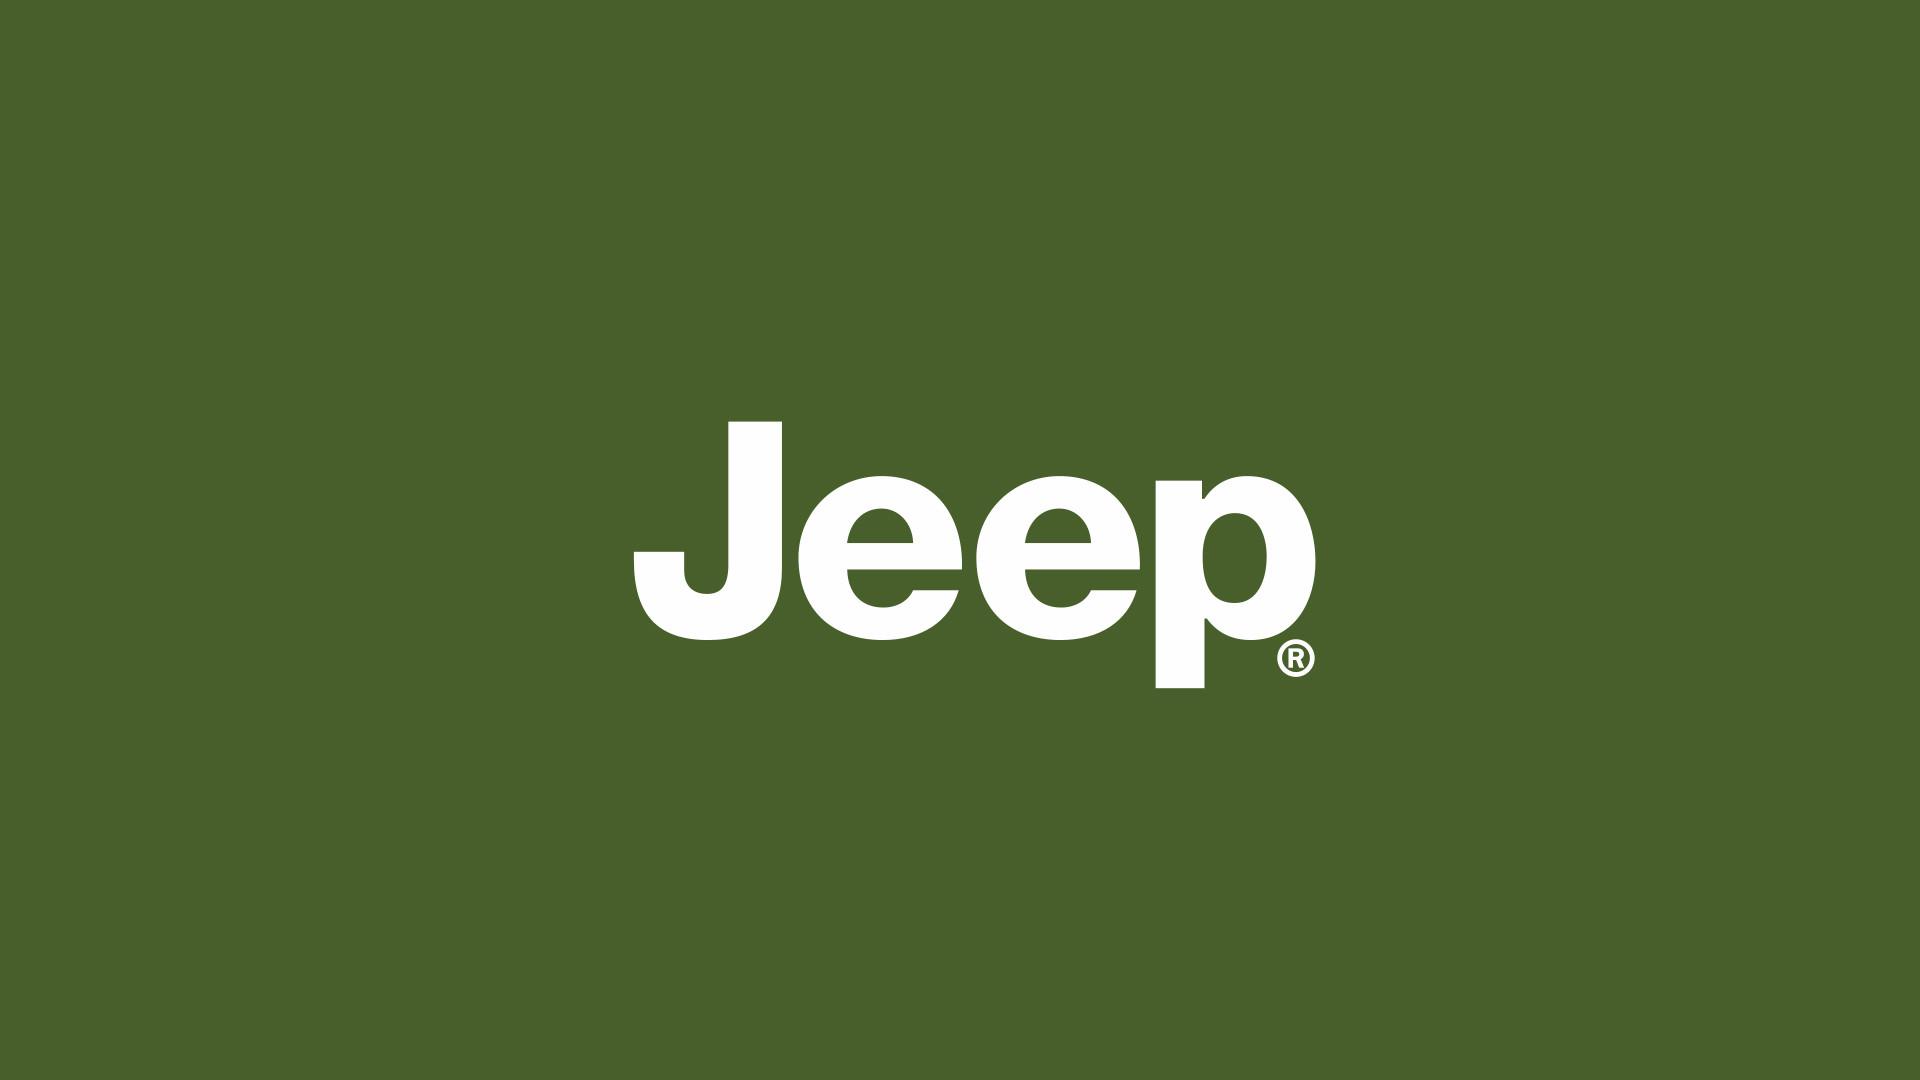 jeep logo hd wallpaper 66852